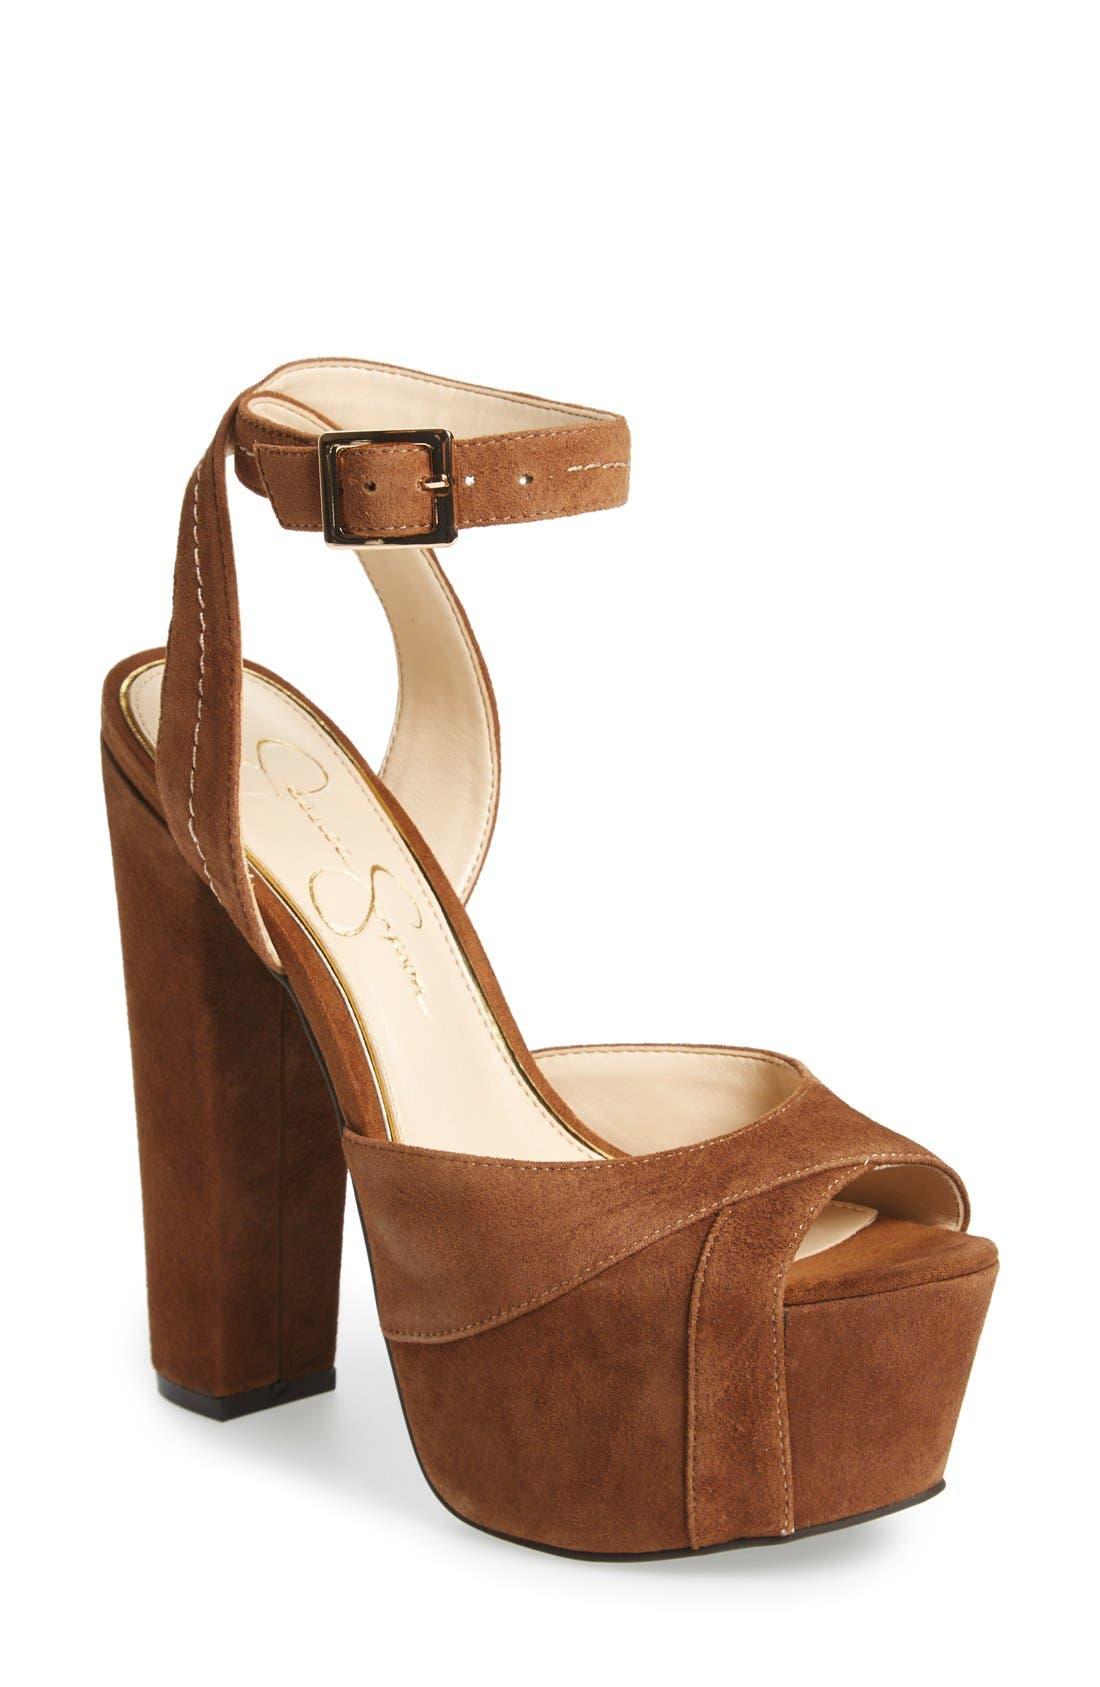 'Dimaya' Platform Sandal,                             Main thumbnail 1, color,                             241